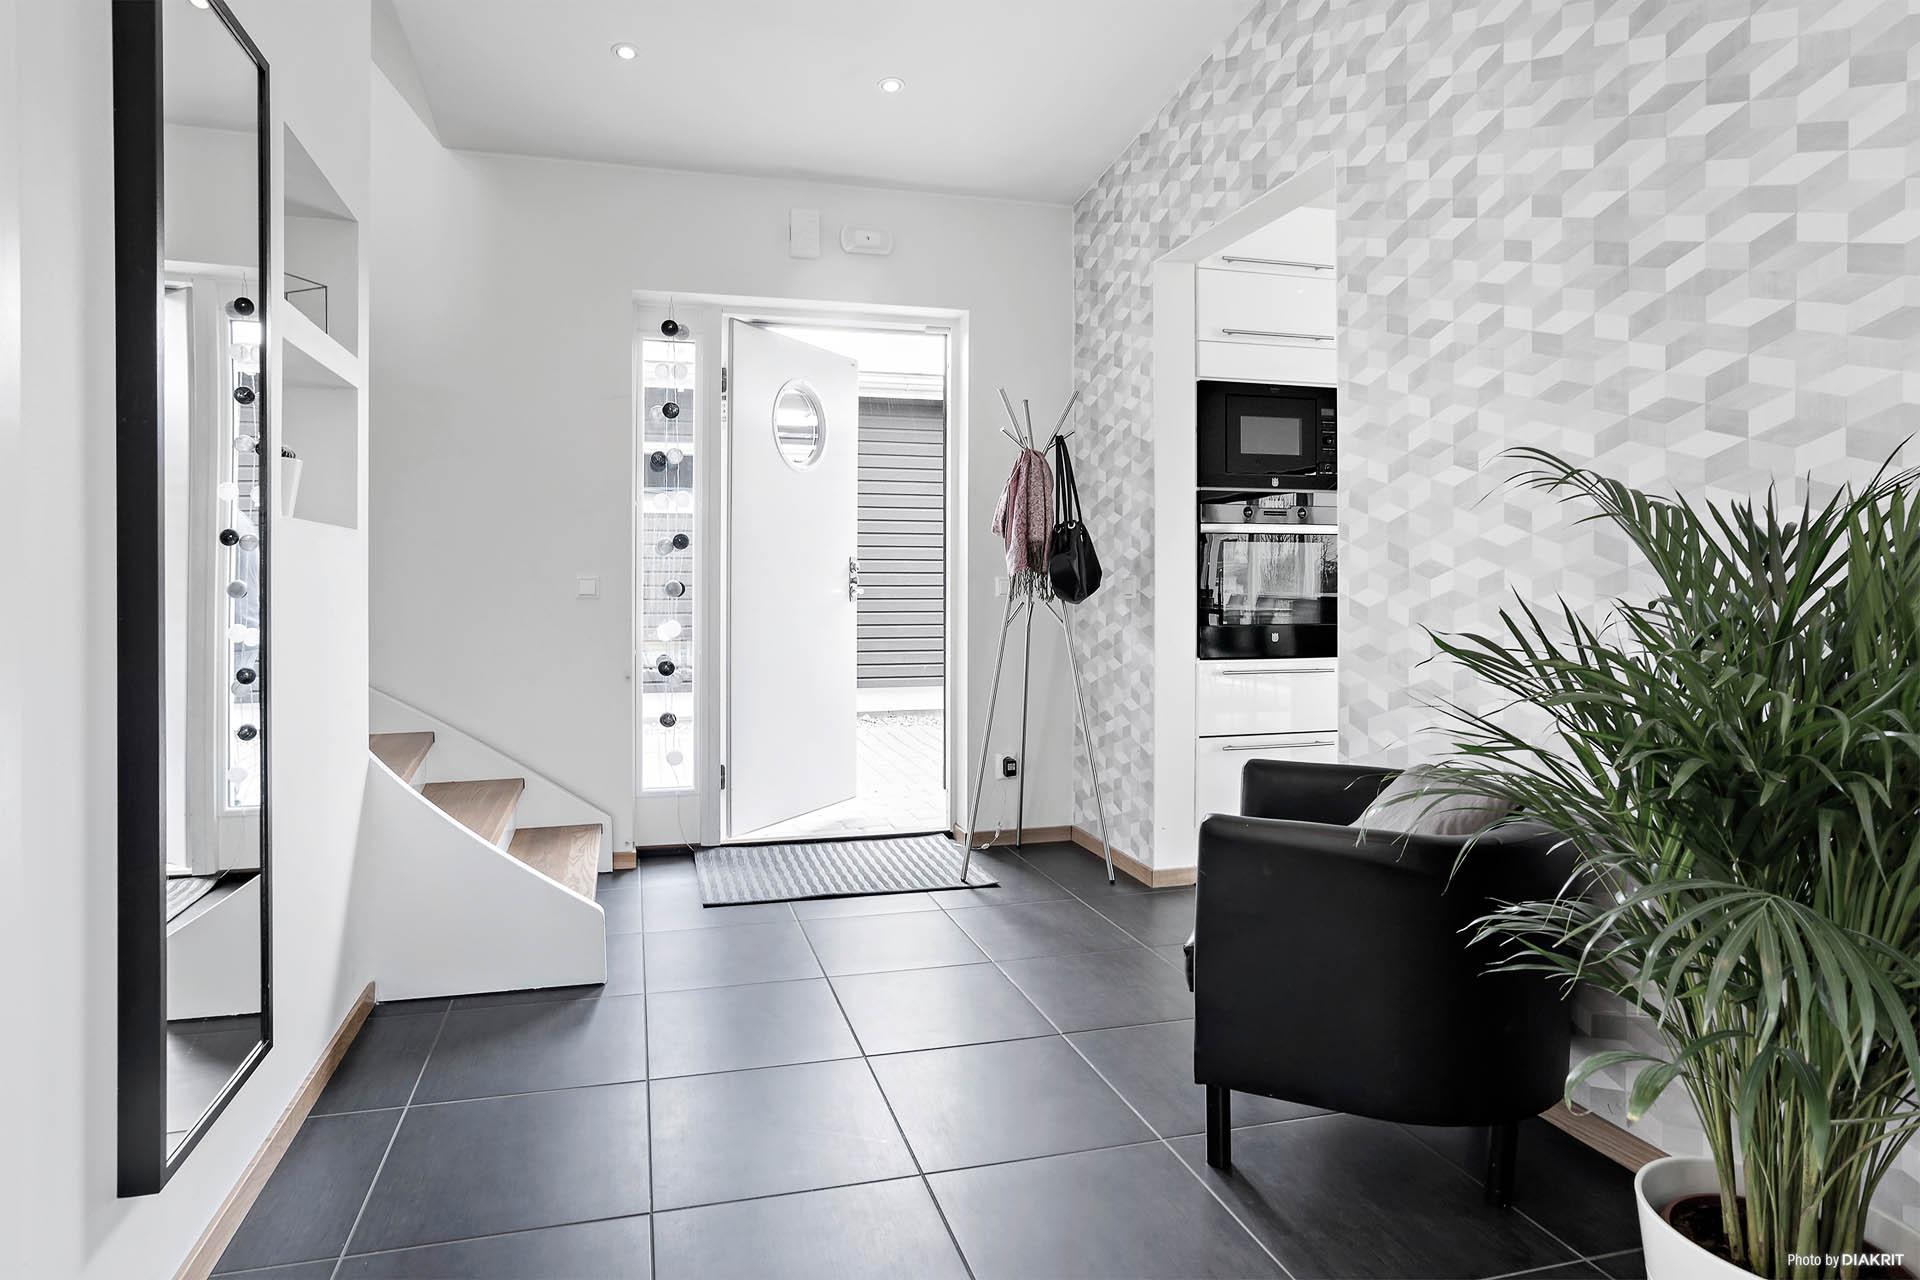 Rymlig hall med klinkers och tapeter med modern design.